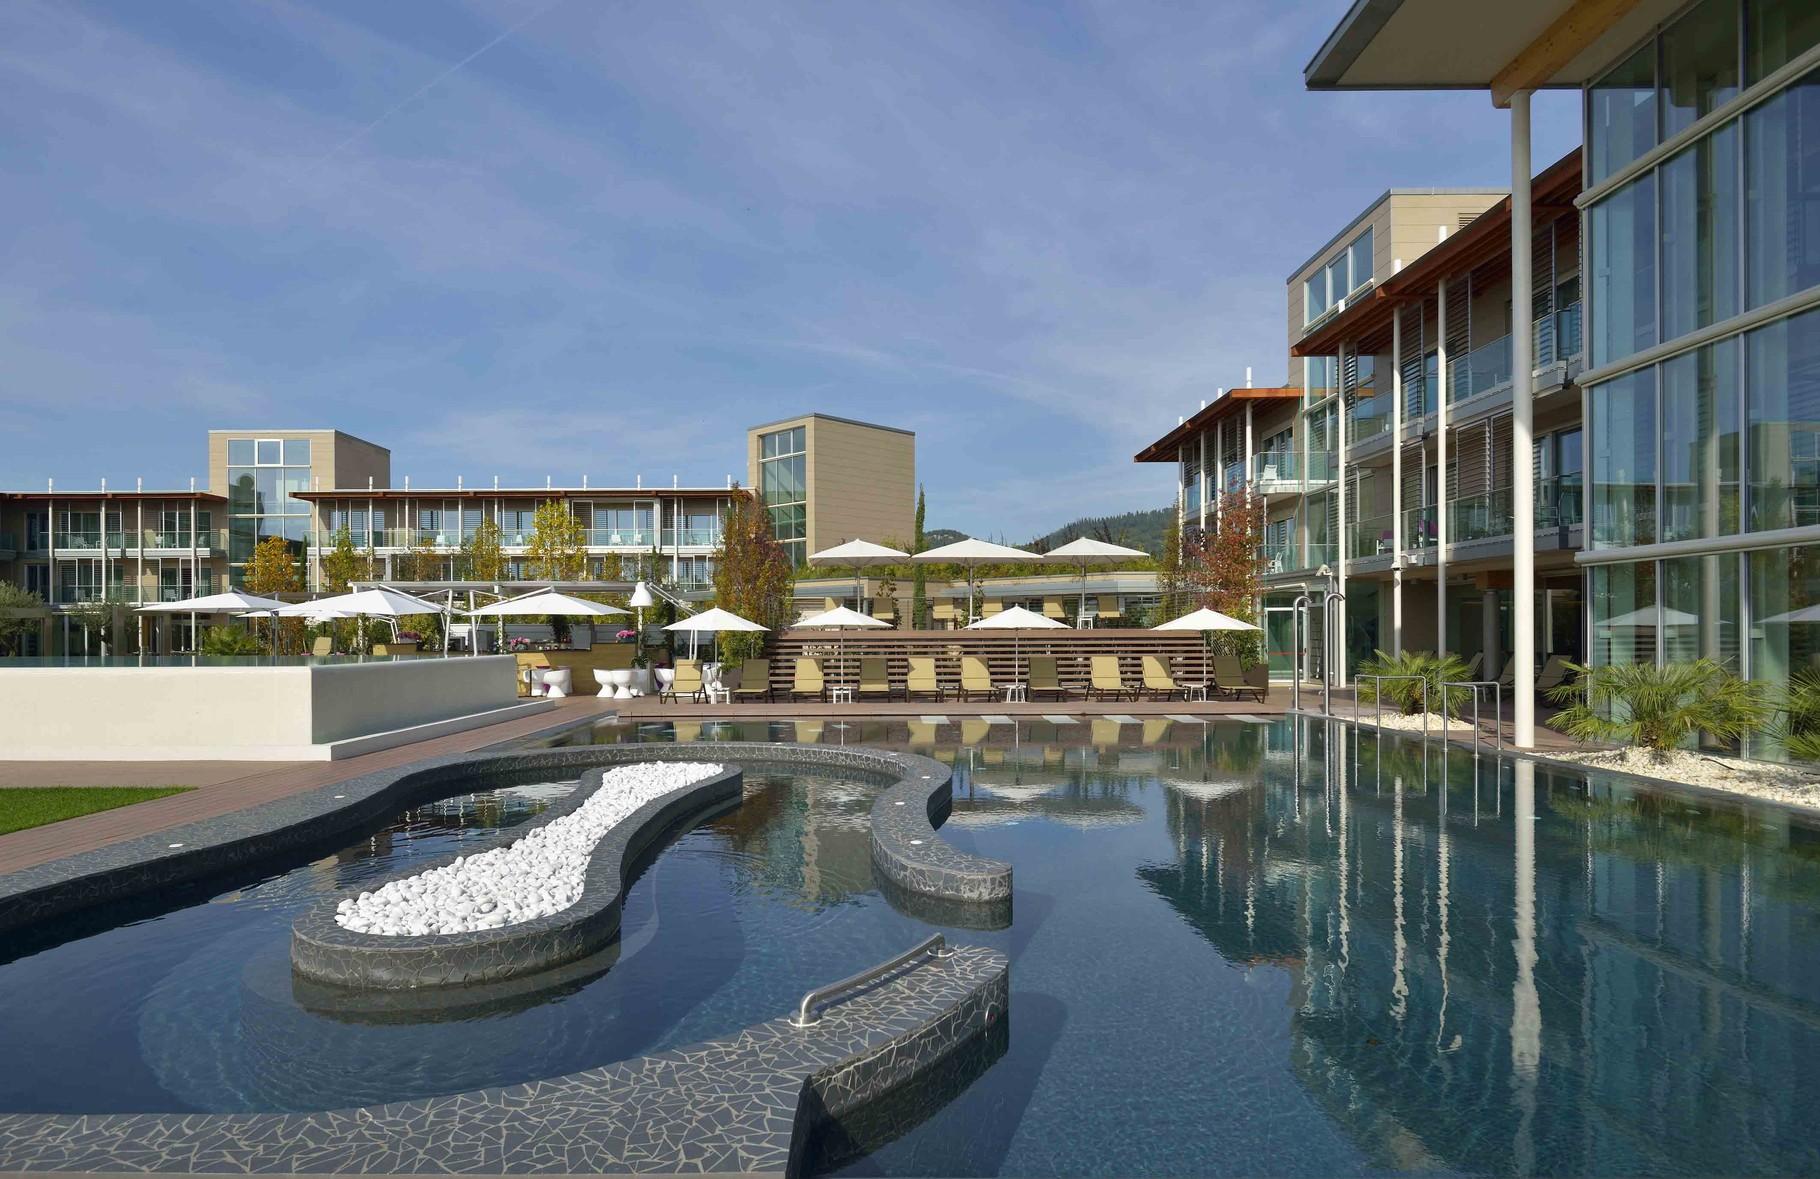 Gardasee bardolino italia golf tours - Hotels in verona with swimming pool ...